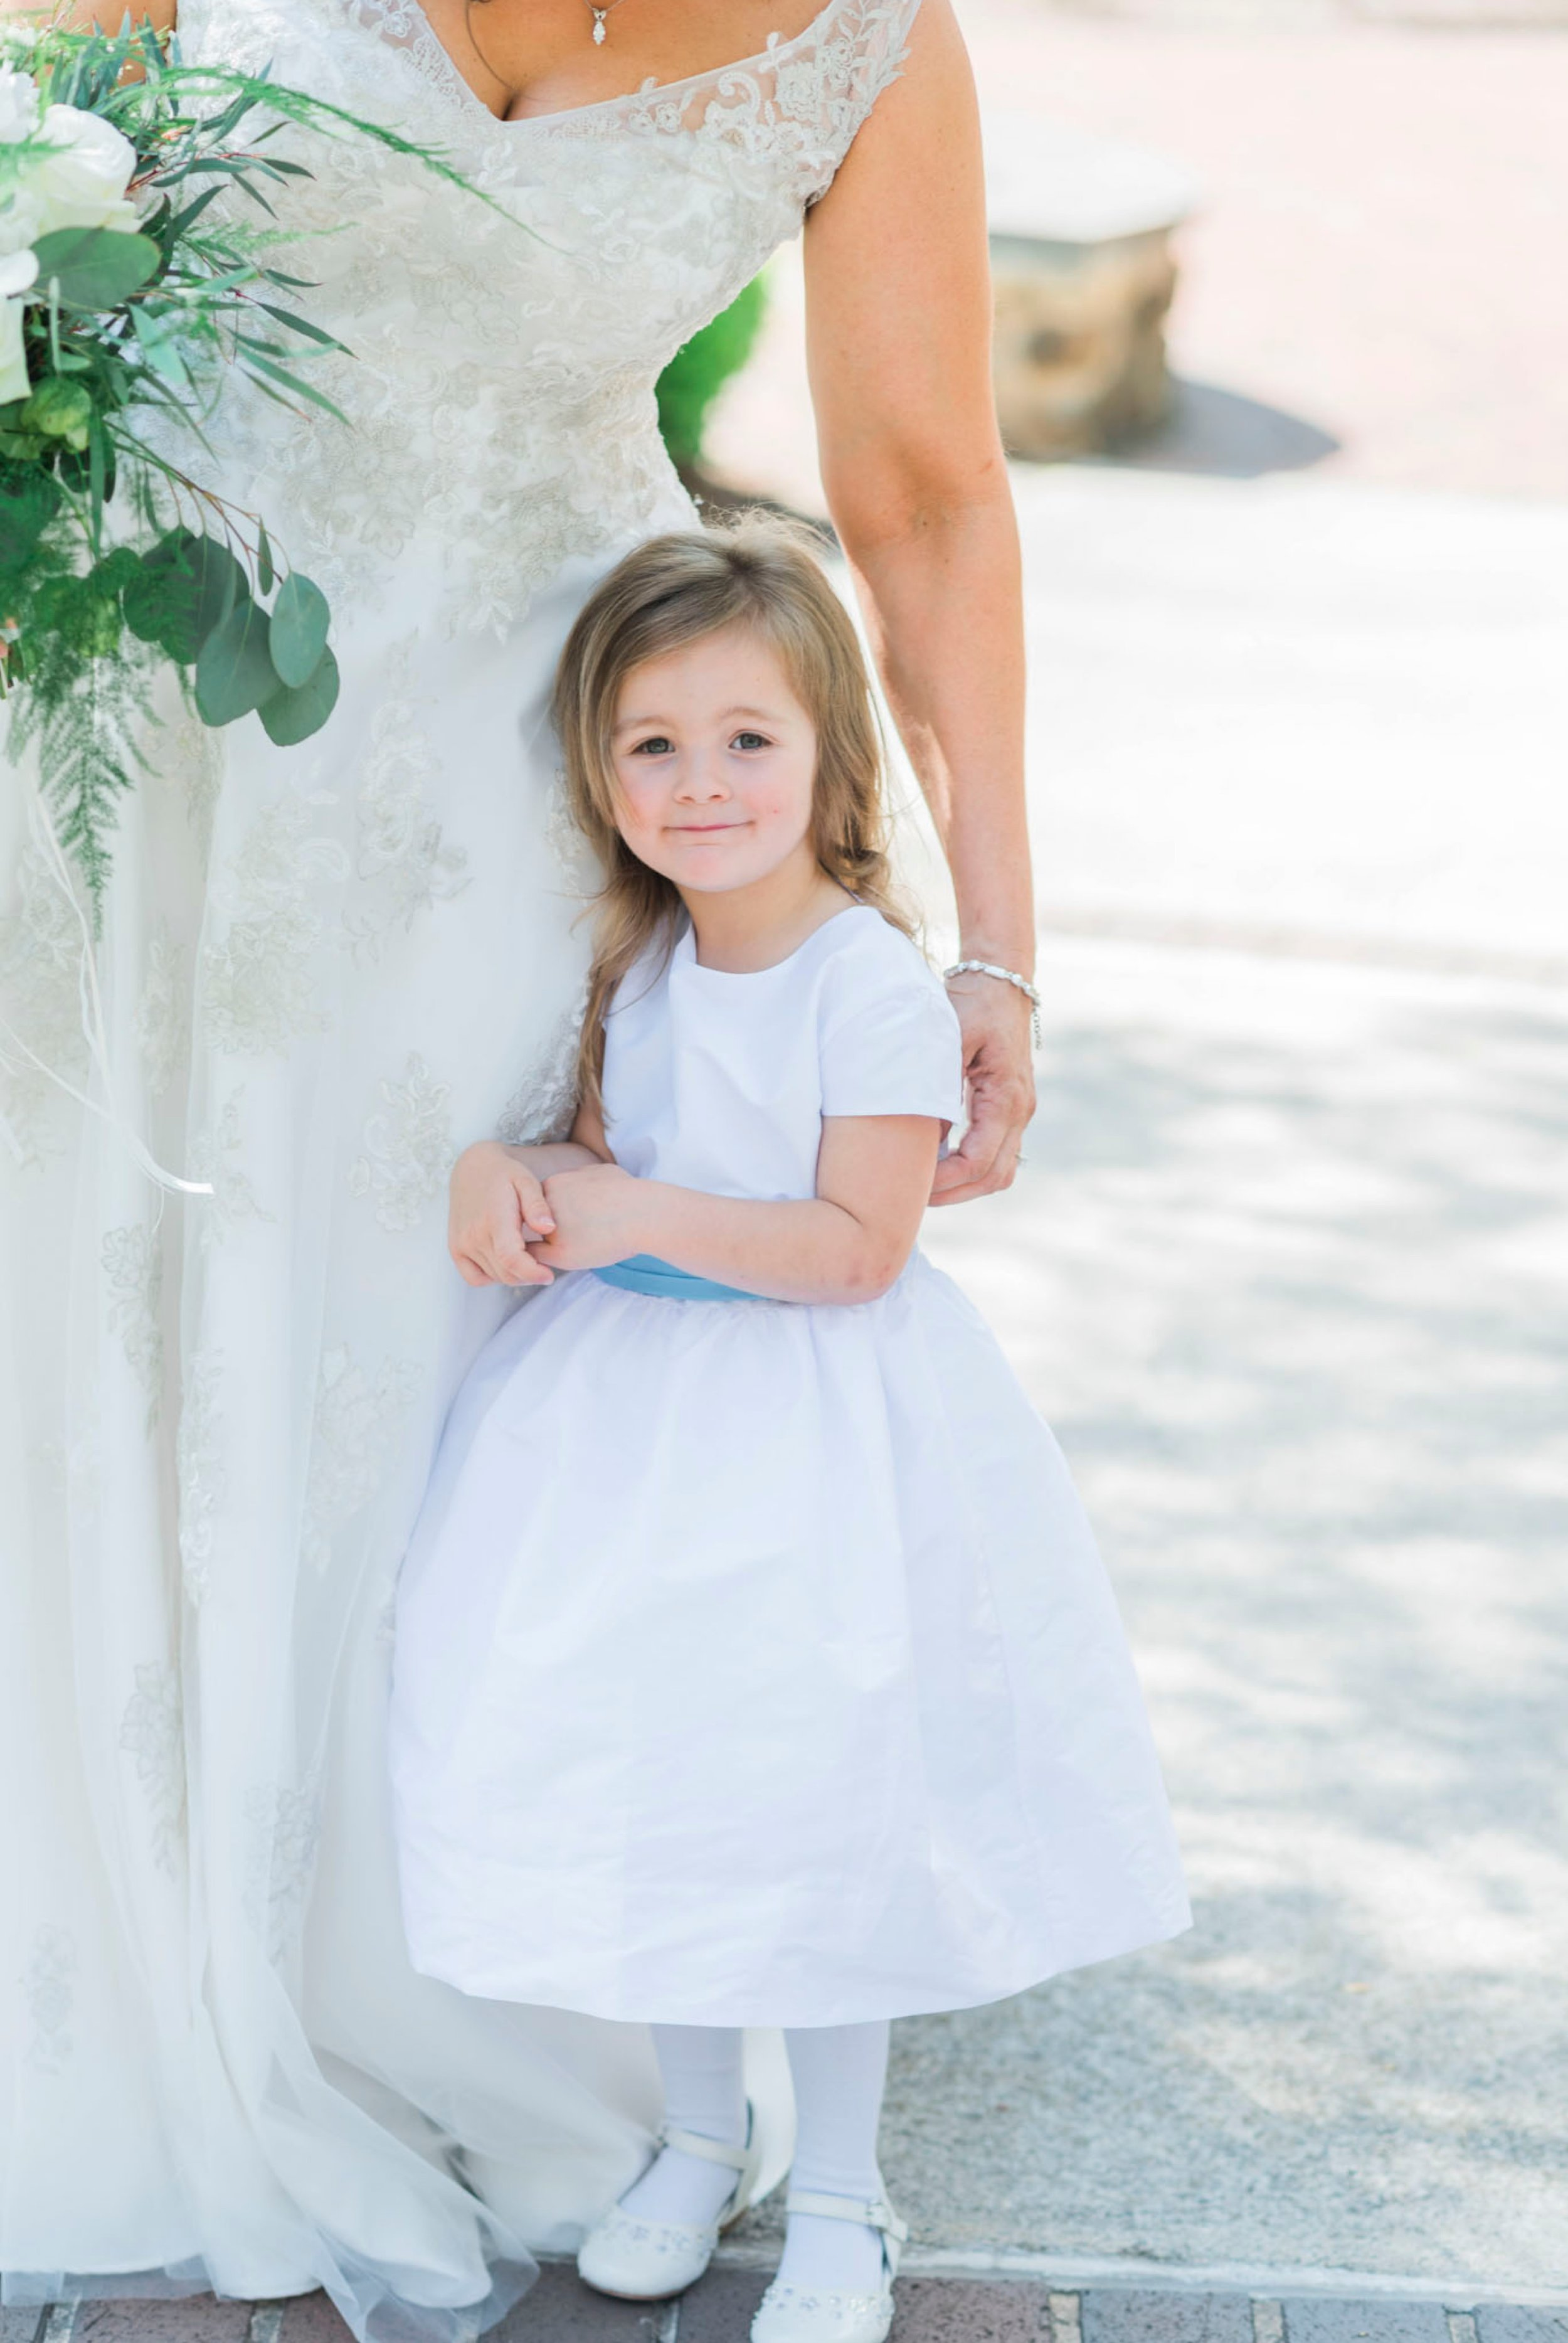 TheVirginianHotel_LynchburgVA_TheVirginianHotelWedding_Virginiaweddingphotographer_Lynchburgvawedding 40.jpg